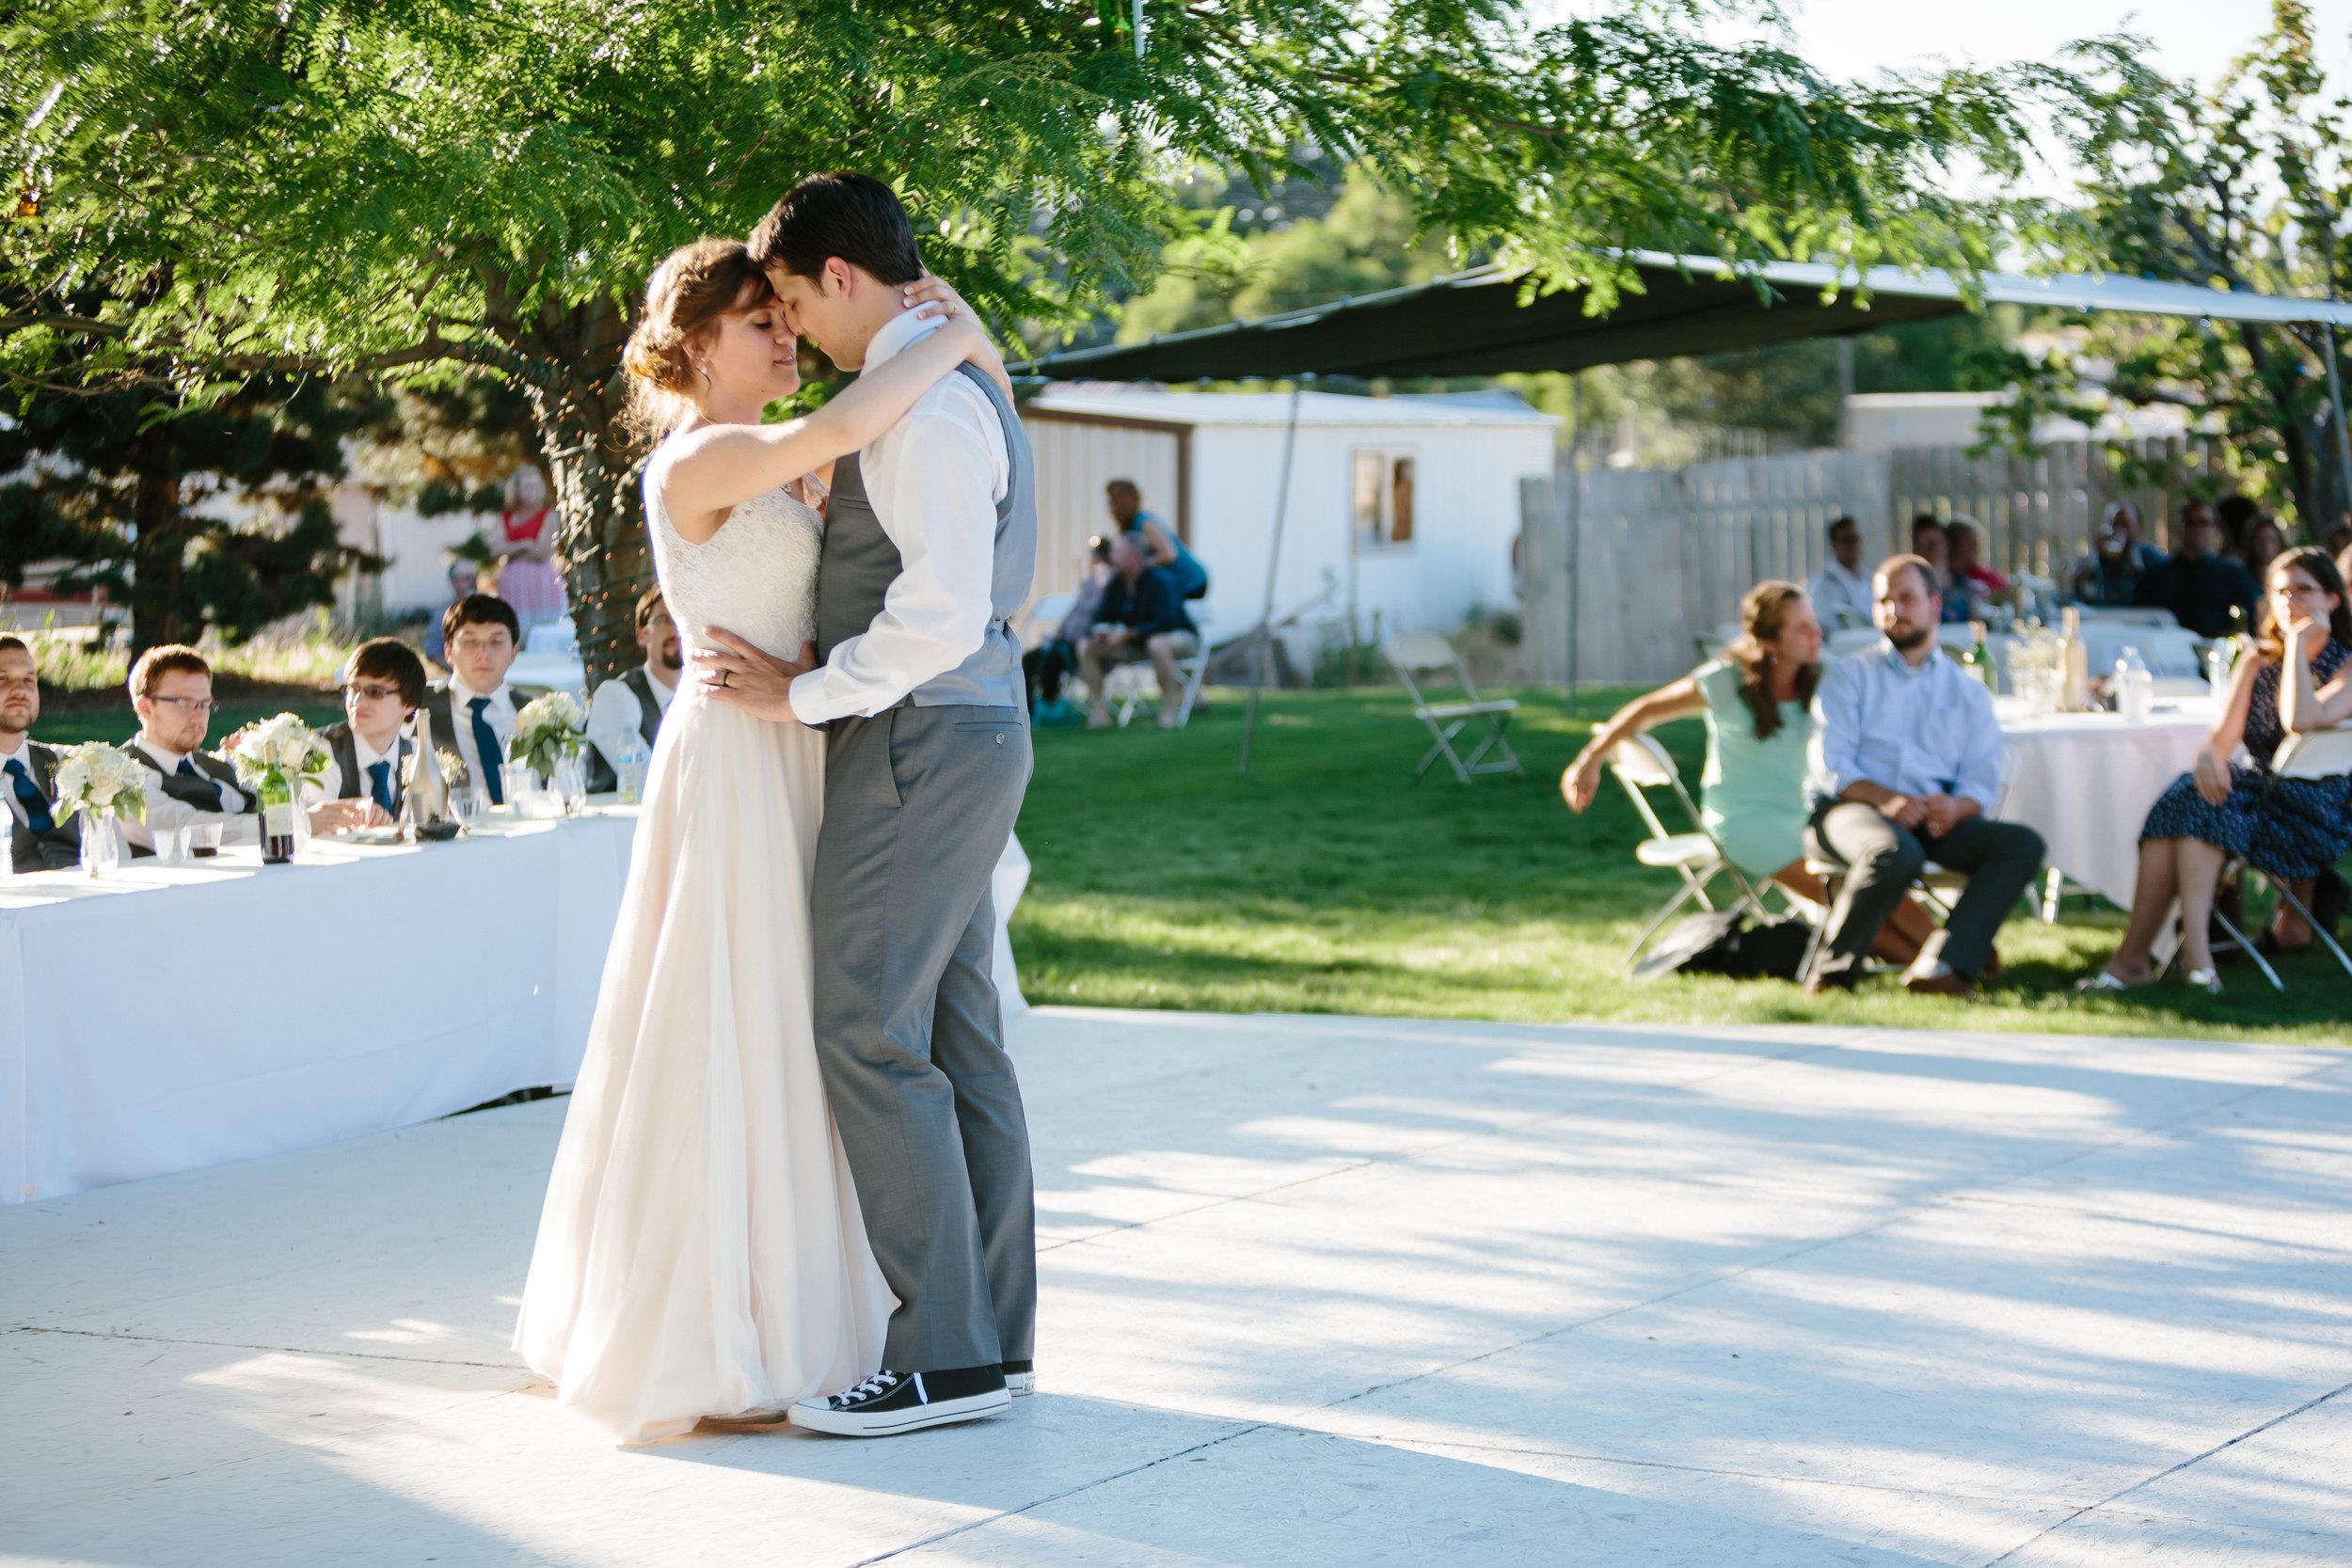 Jordan & Shantel Married - Idaho - Corrie Mick Photography-296.jpg